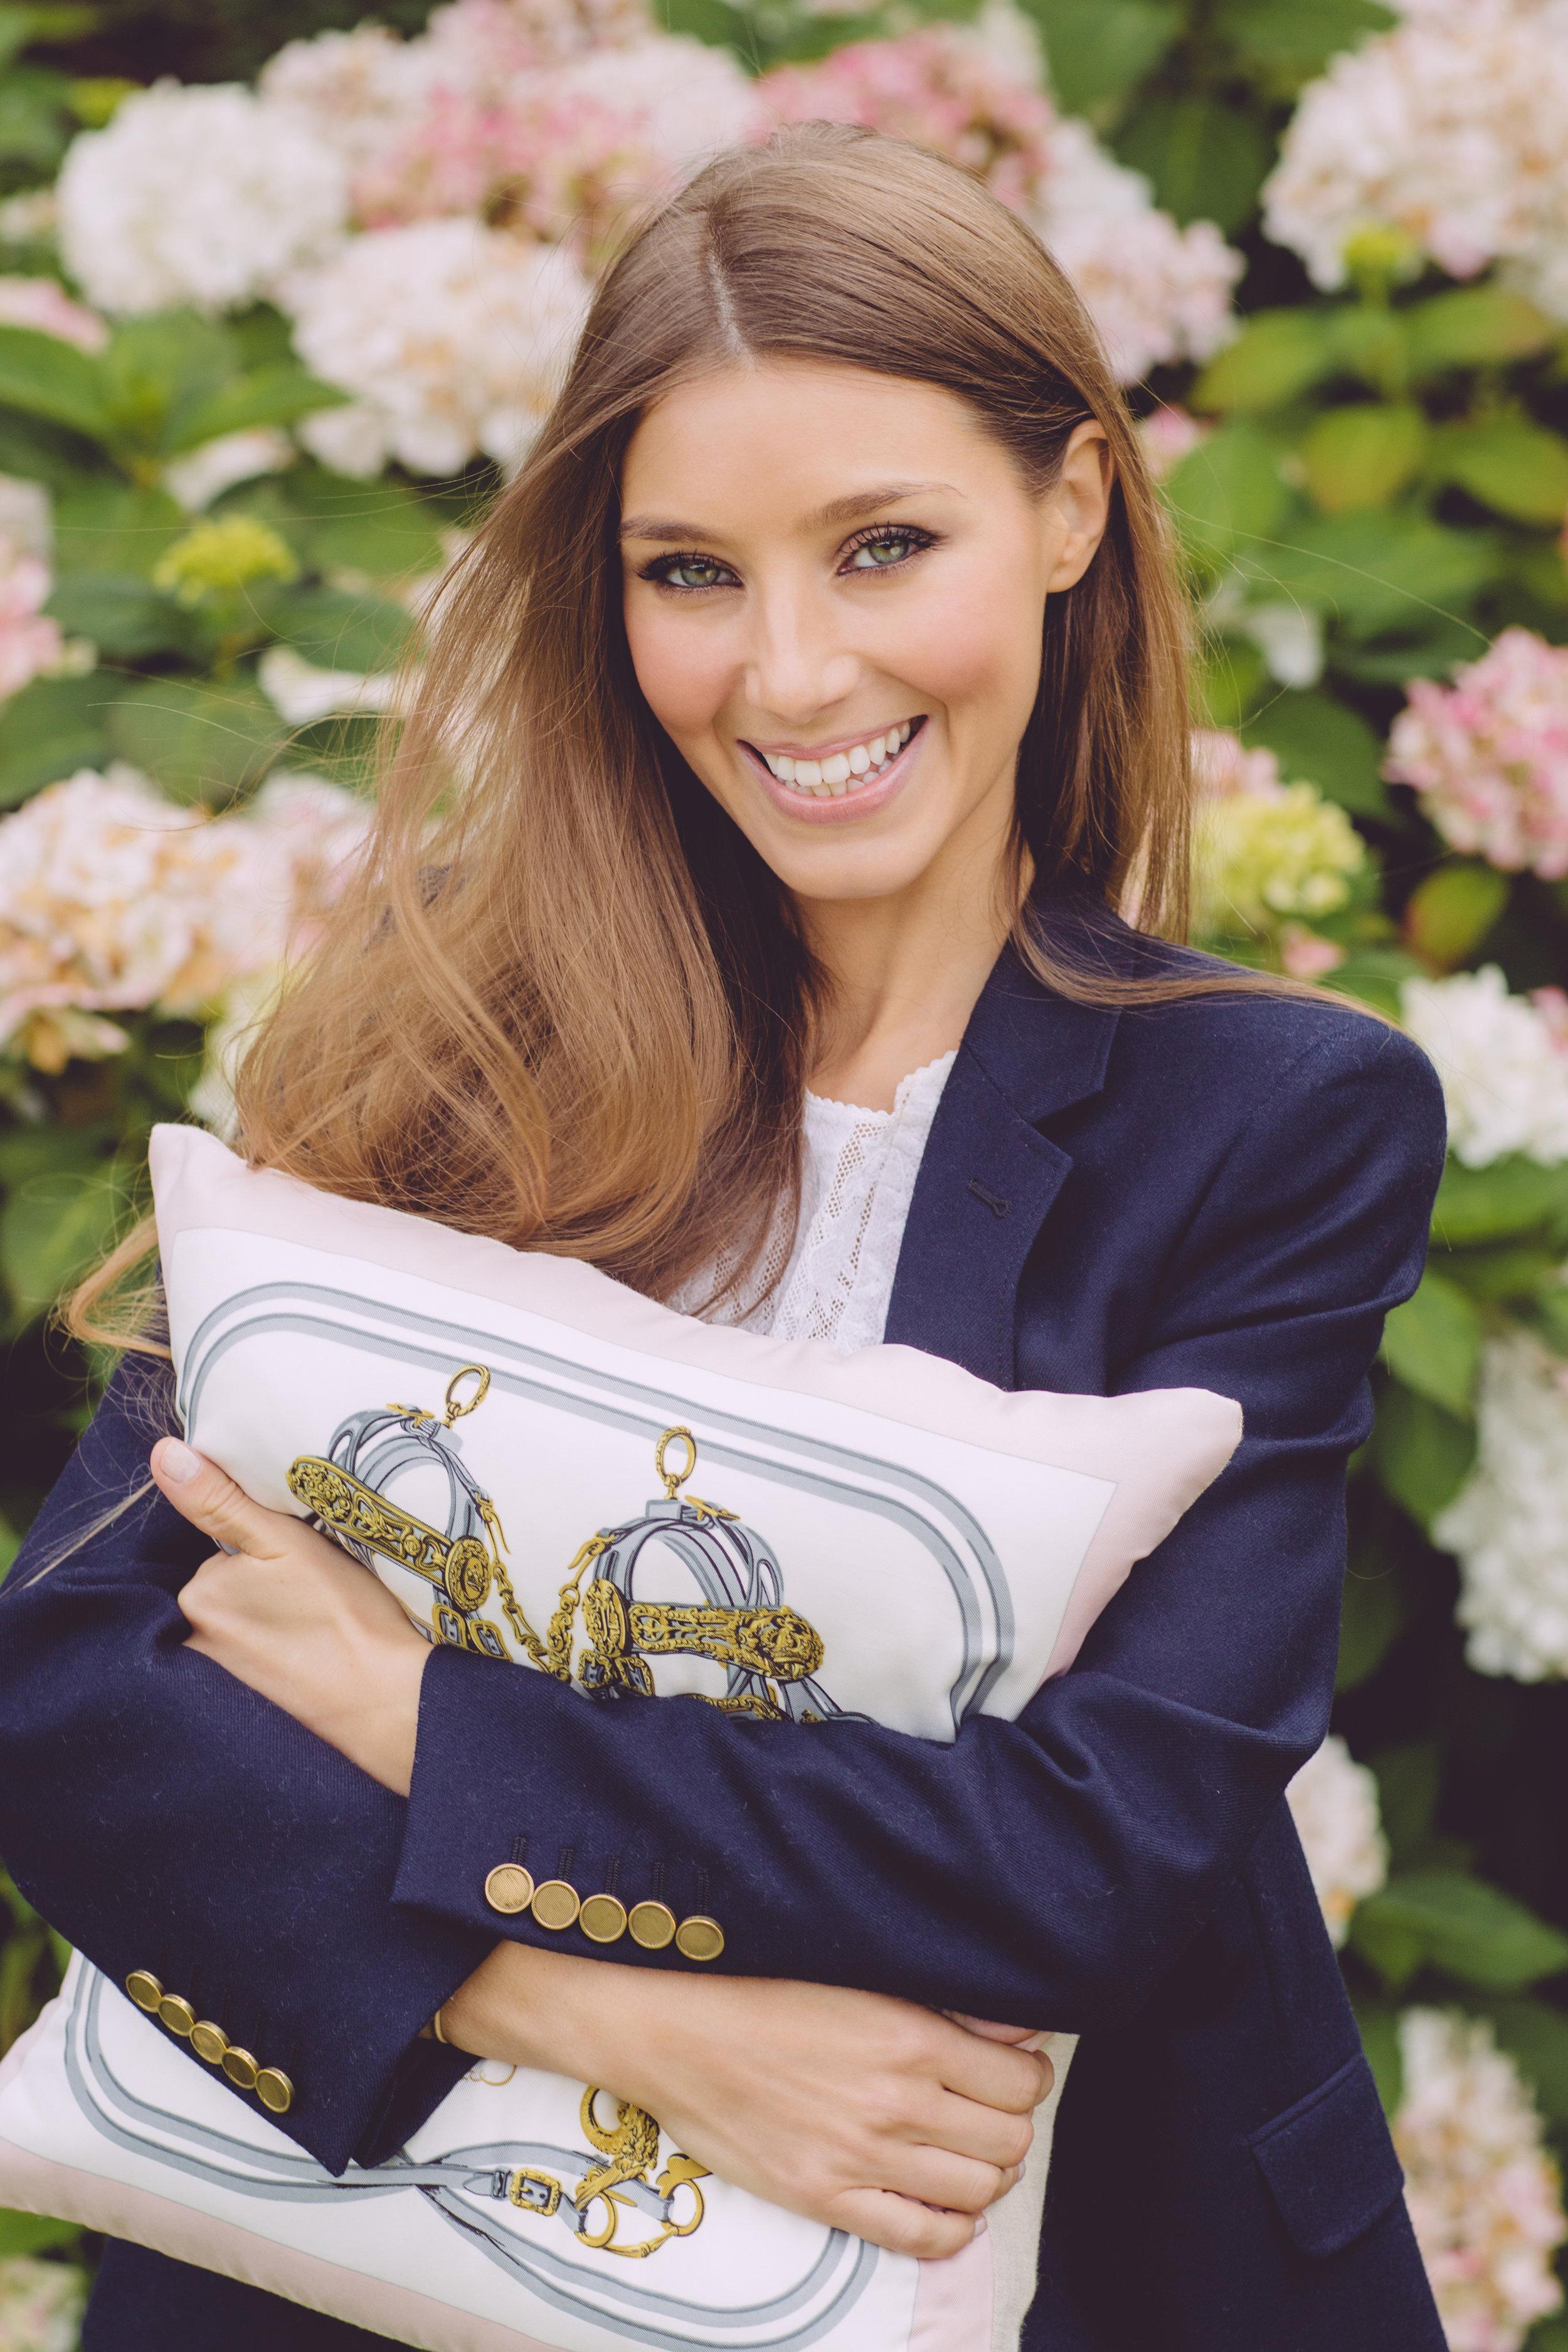 Northern Irish Designer Katie Larmour Luxury Couture Cushions Irish Linen Bespoke Pillows Luxury Vintage Silk Scarf.jpg